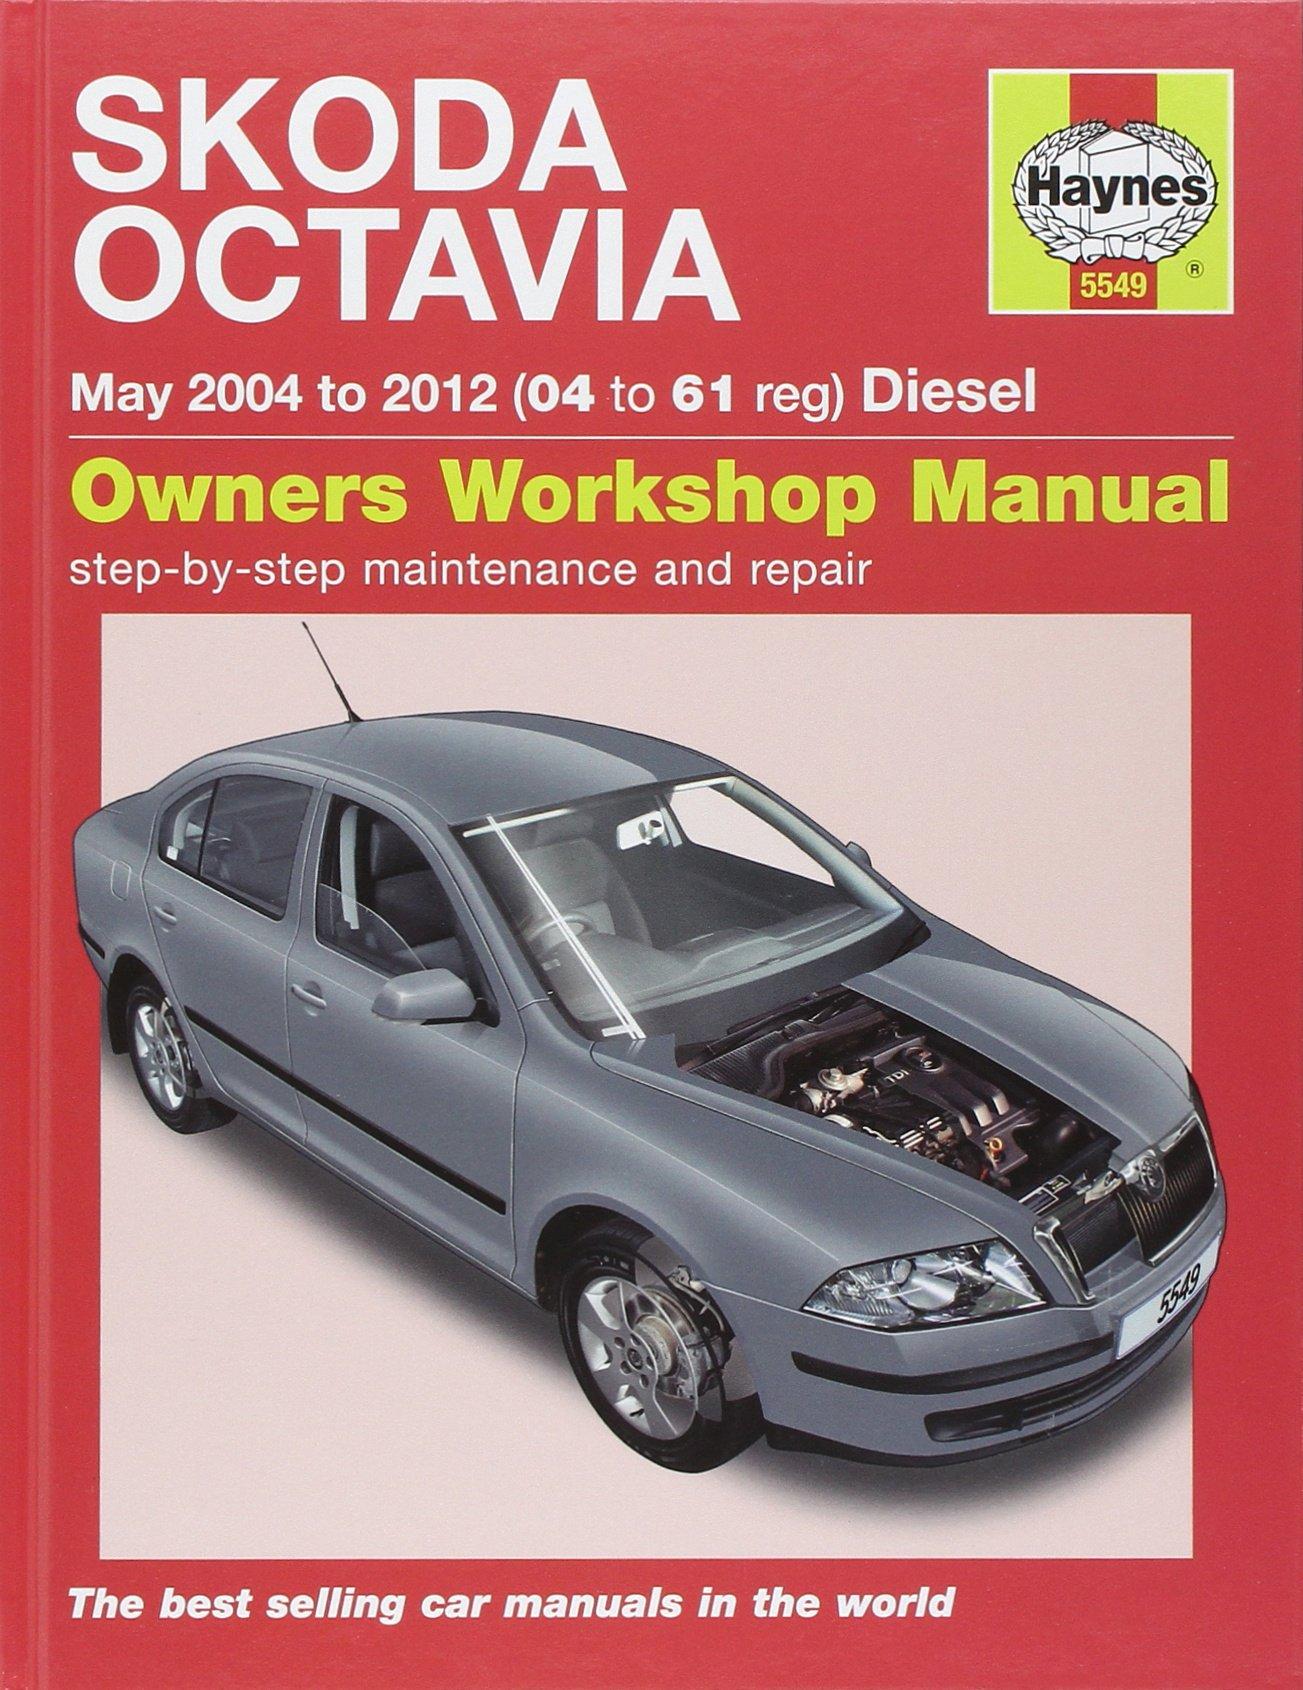 skoda merchandise amazon co uk rh amazon co uk skoda superb repair manual skoda octavia service repair workshop manual 2010